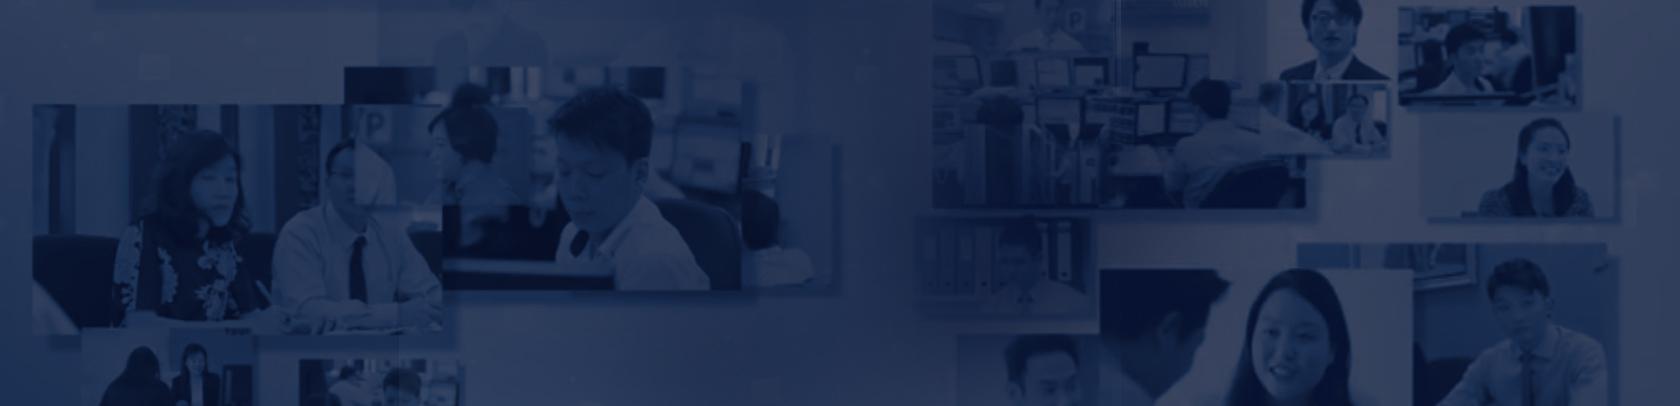 Preparing an Employee Stock Option Plan (ESOP) in Singapore | blogger.com